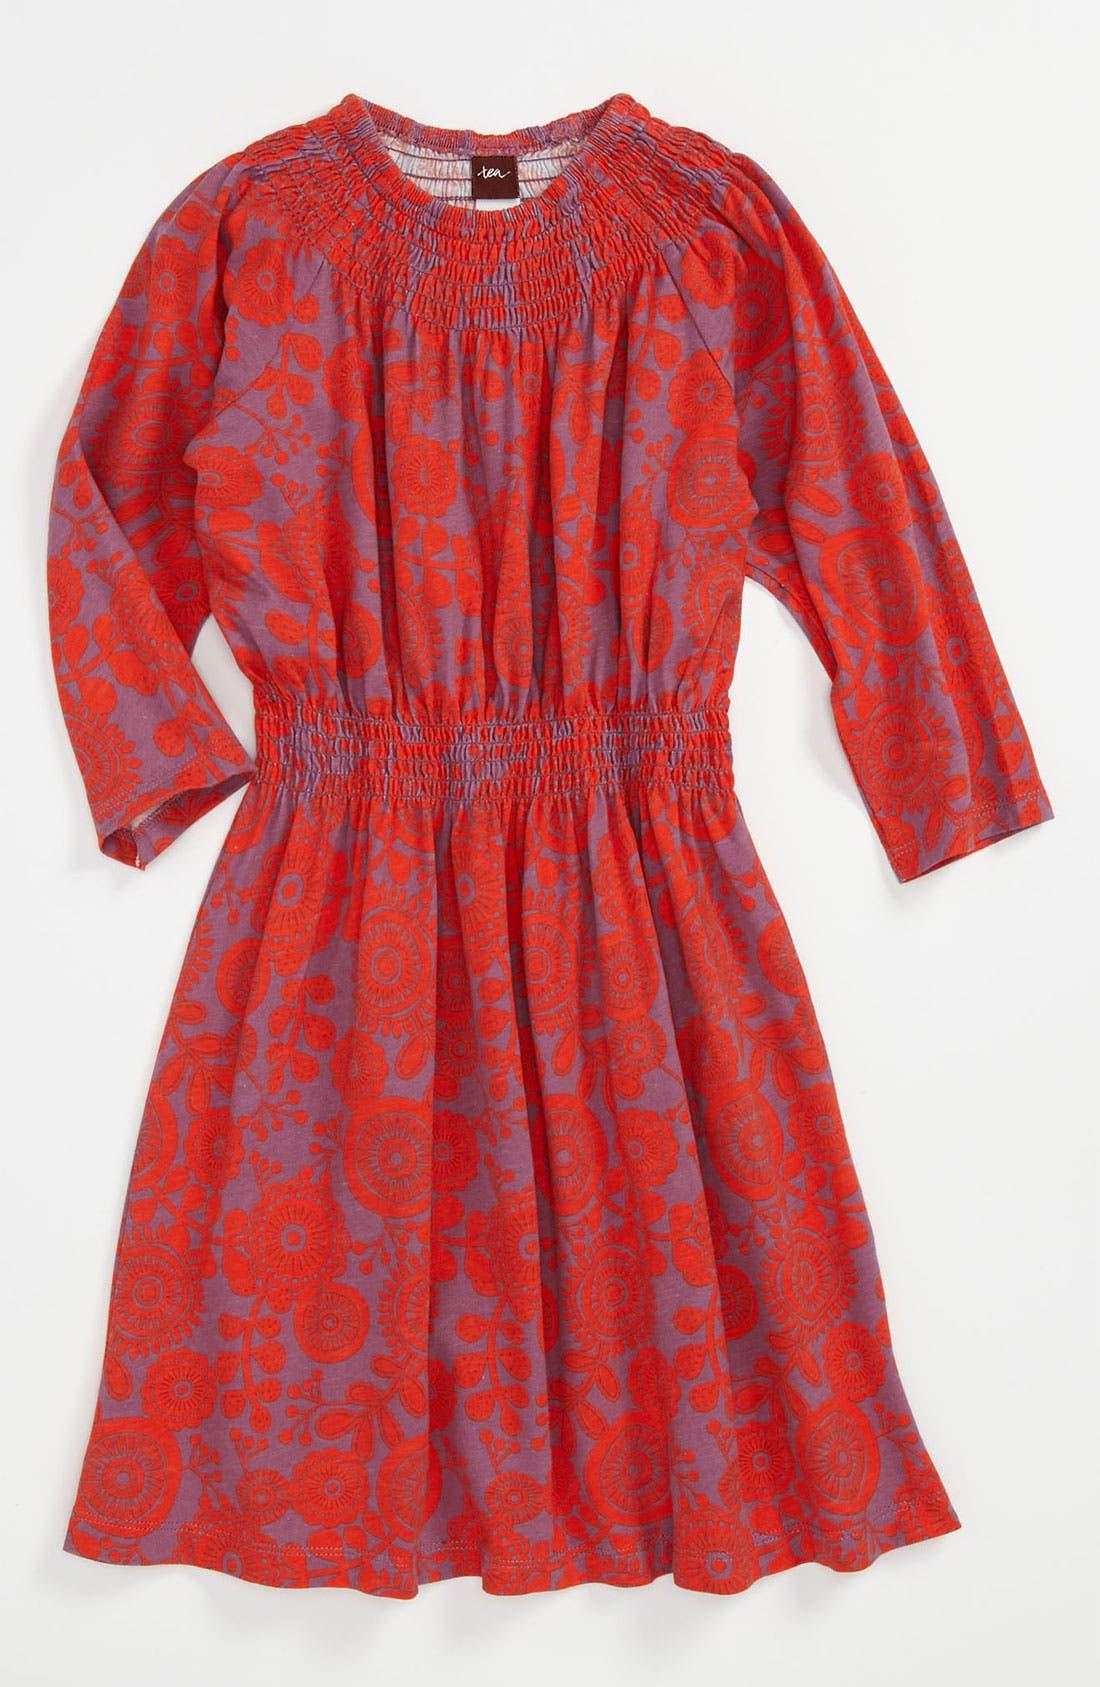 Alternate Image 1 Selected - Tea Collection Smocked Dress (Little Girls & Big Girls)